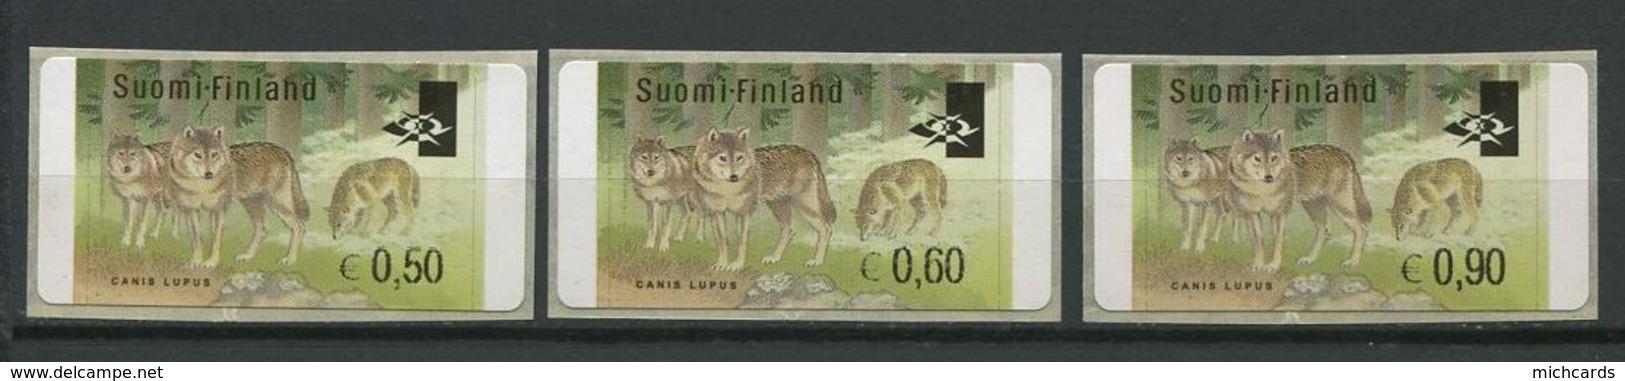 255 FINLANDE 2002 - Yvert 32 Distributeur Adhesif - Loups - Neuf ** (MNH) Sans Trace De Charniere - Finland